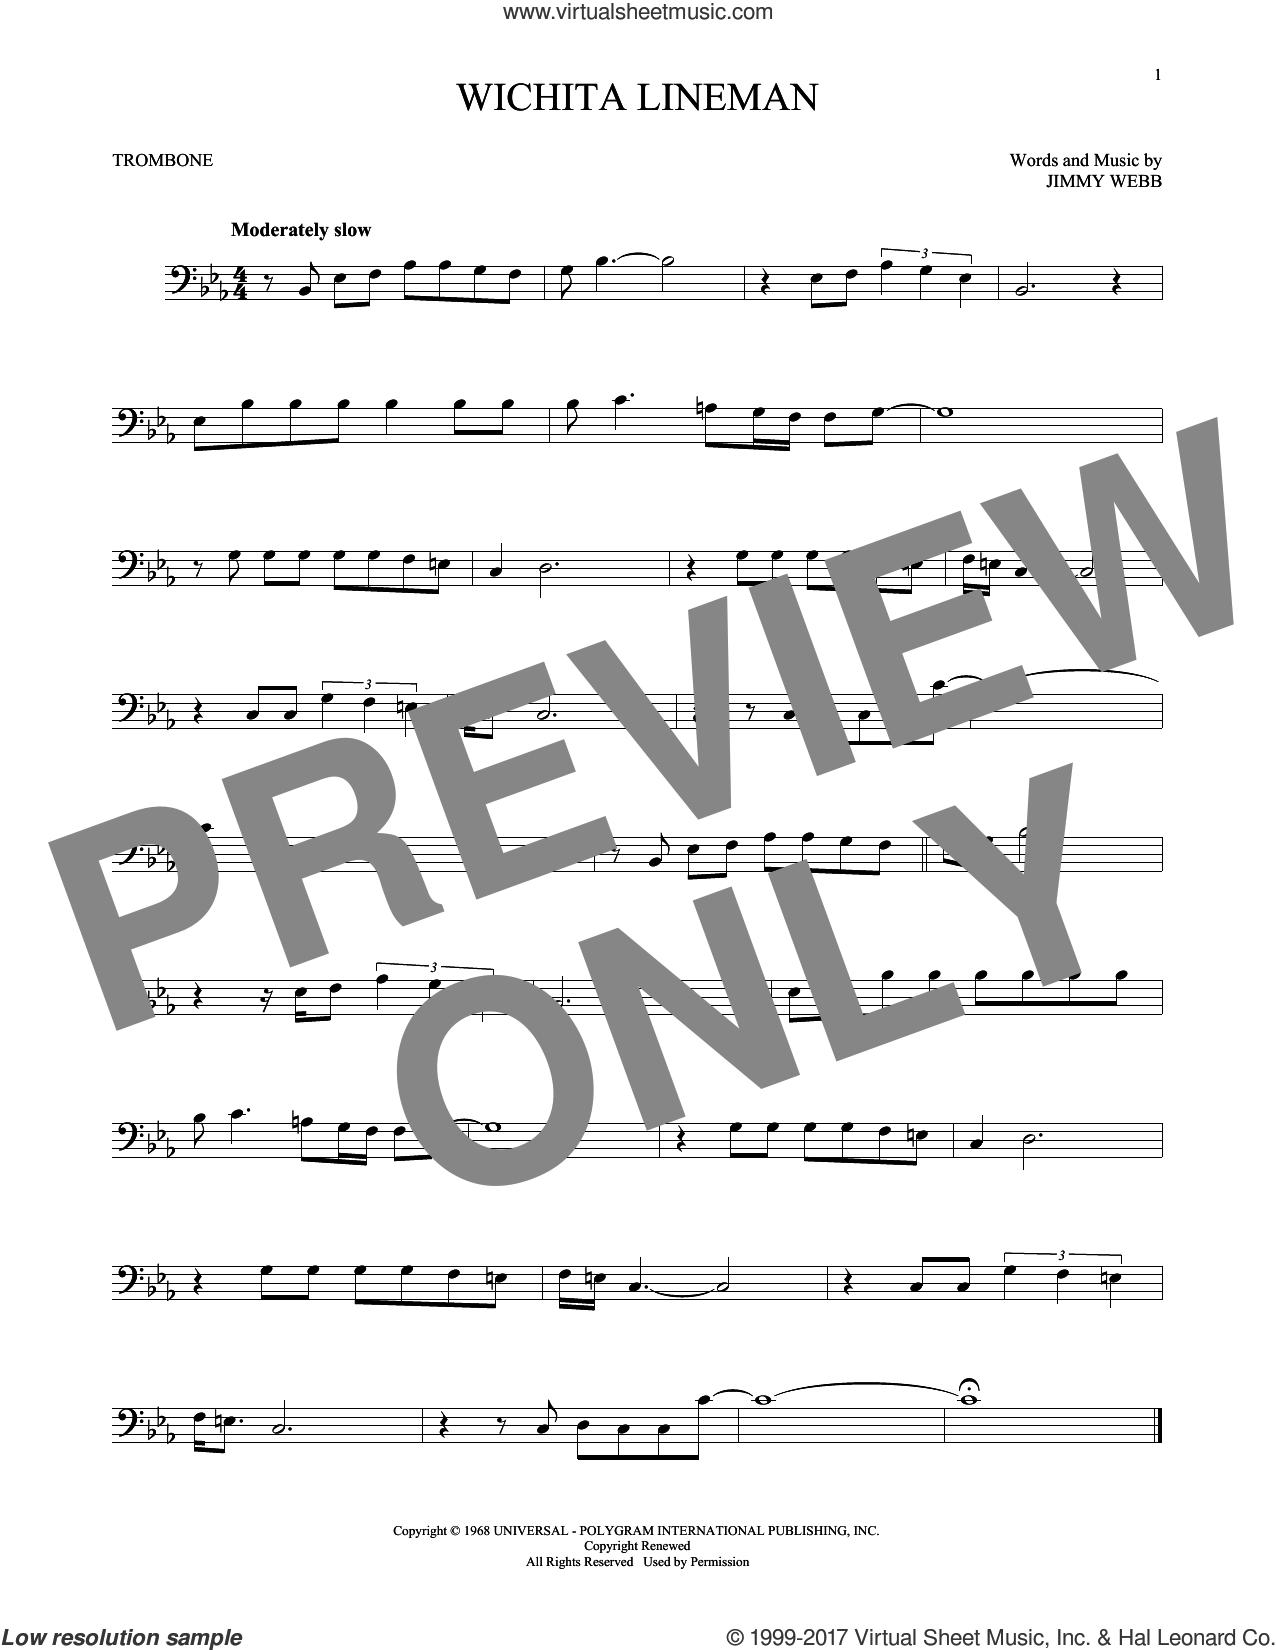 Wichita Lineman sheet music for trombone solo by Glen Campbell and Jimmy Webb, intermediate skill level